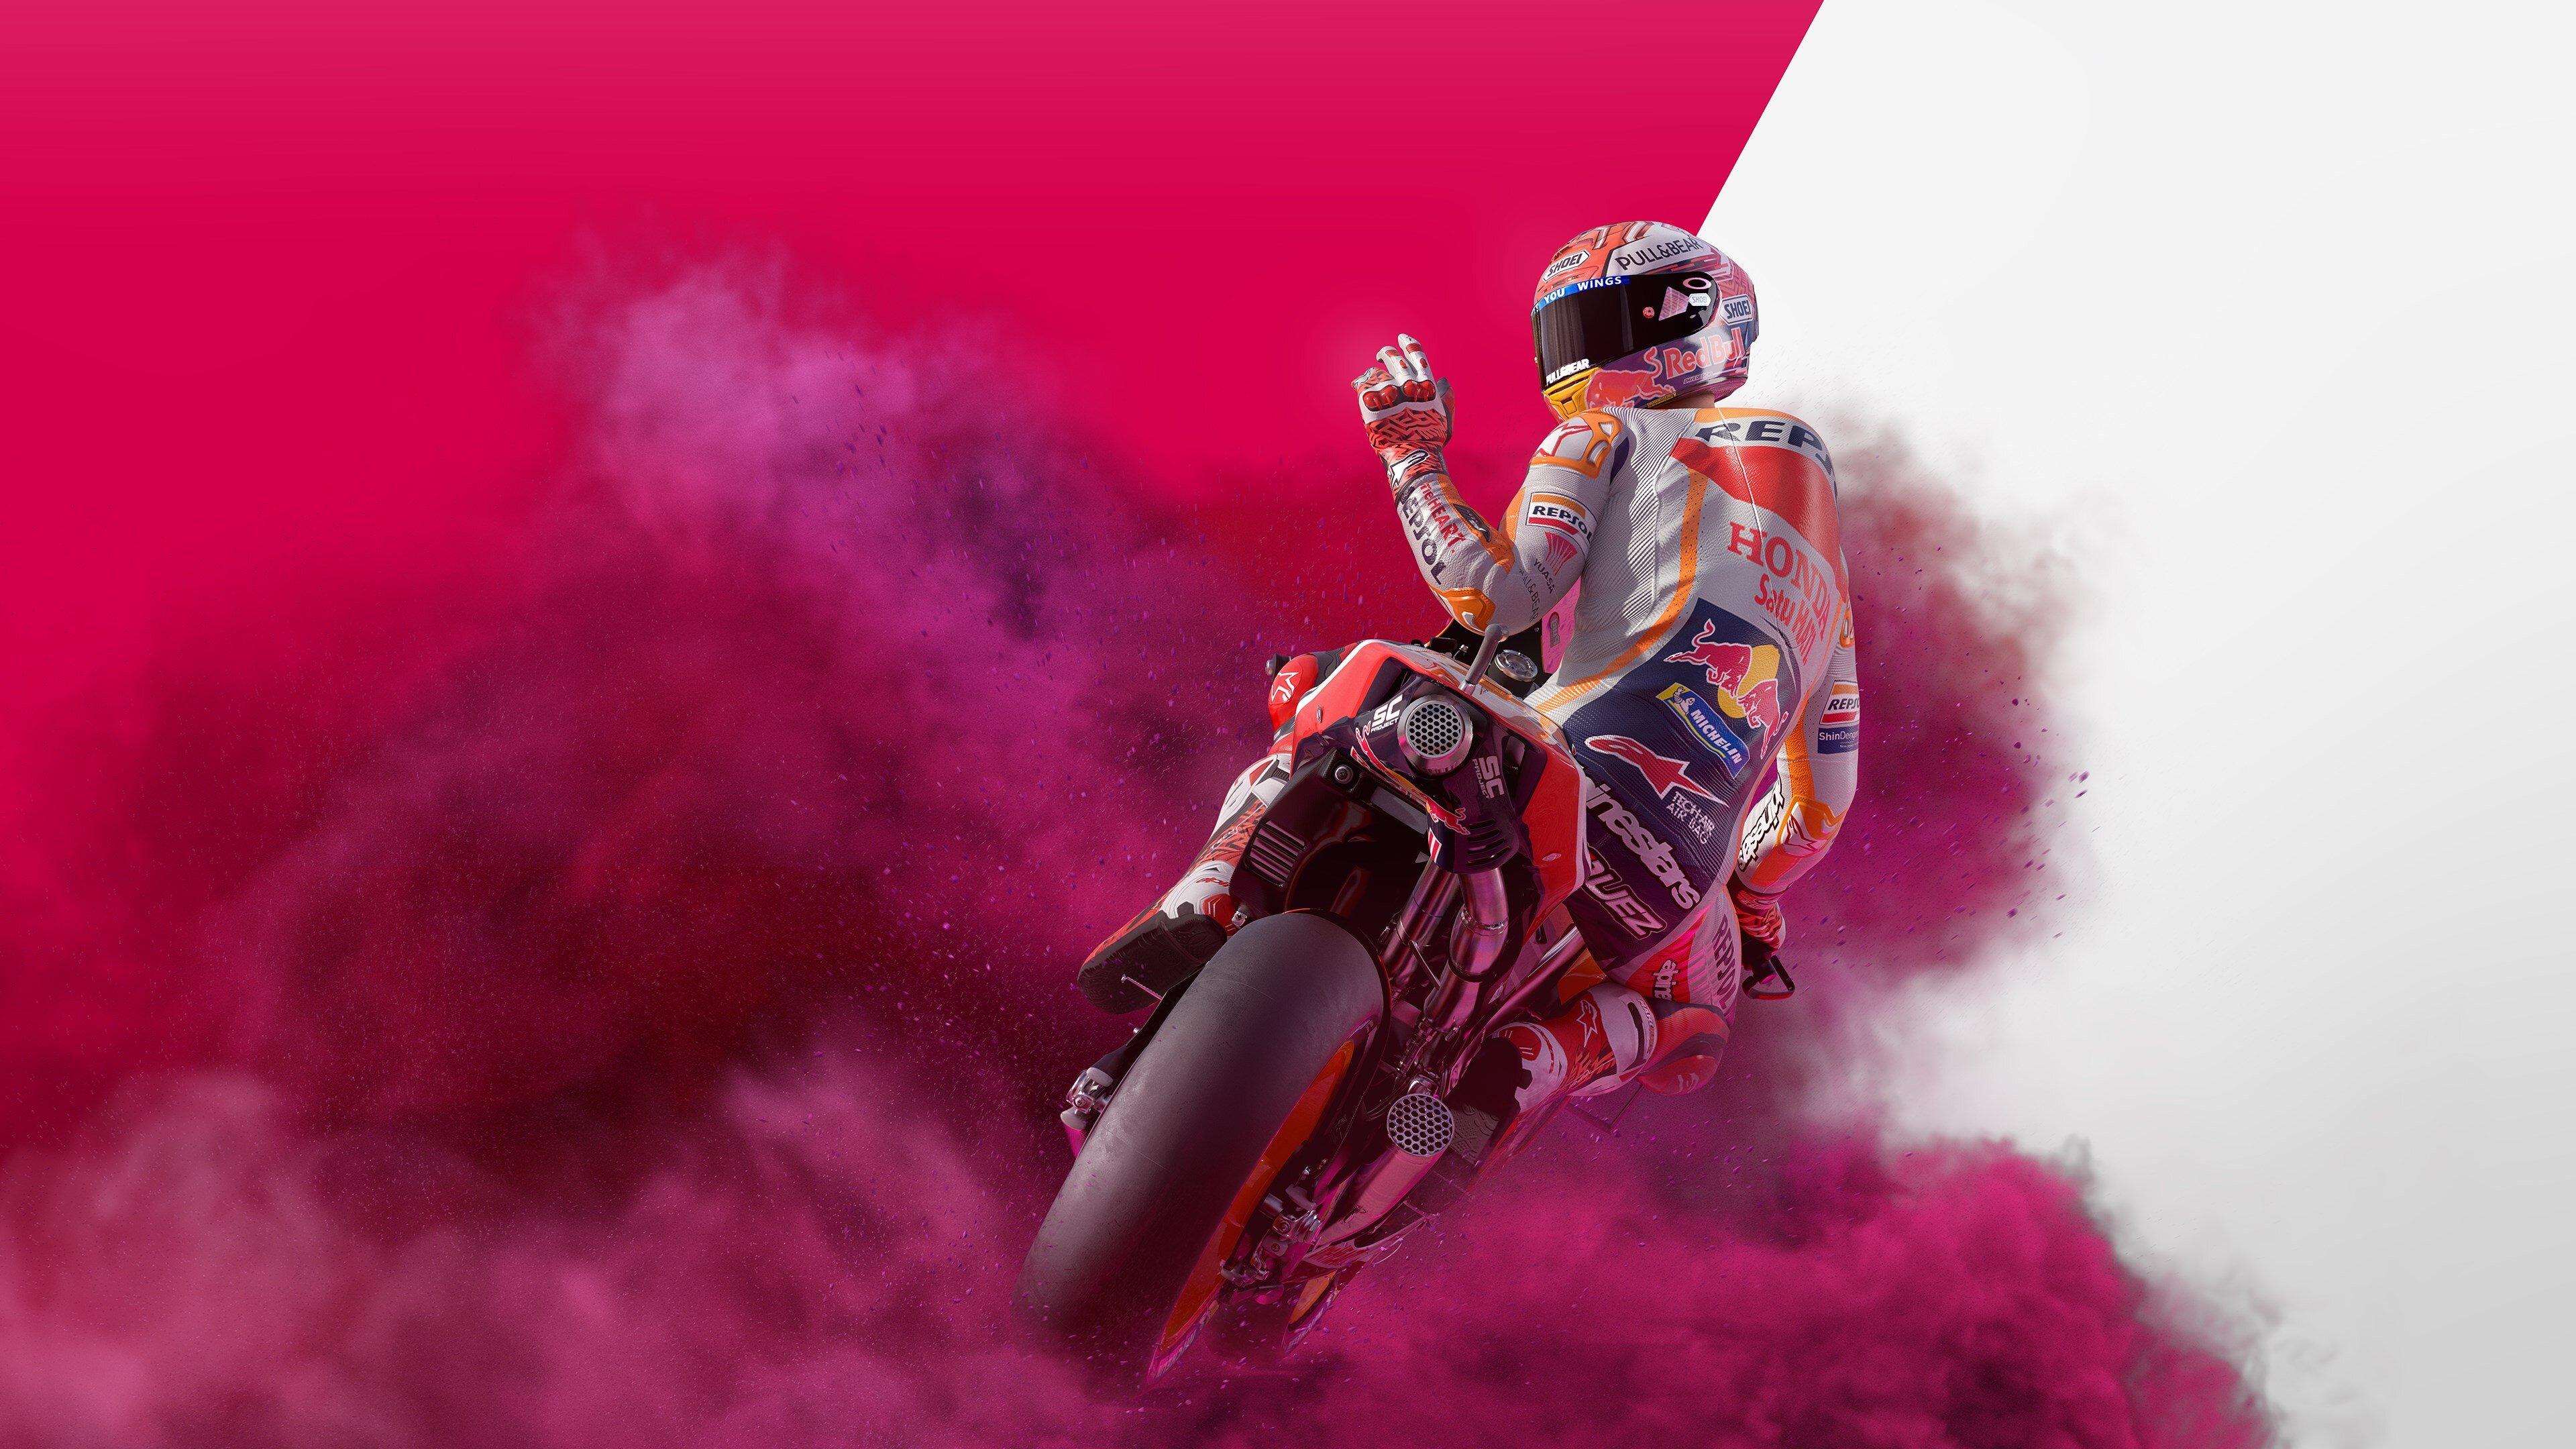 motogp 19 1565054584 - MotoGP 19 - moto gp 19 wallpapers, hd-wallpapers, games wallpapers, 4k-wallpapers